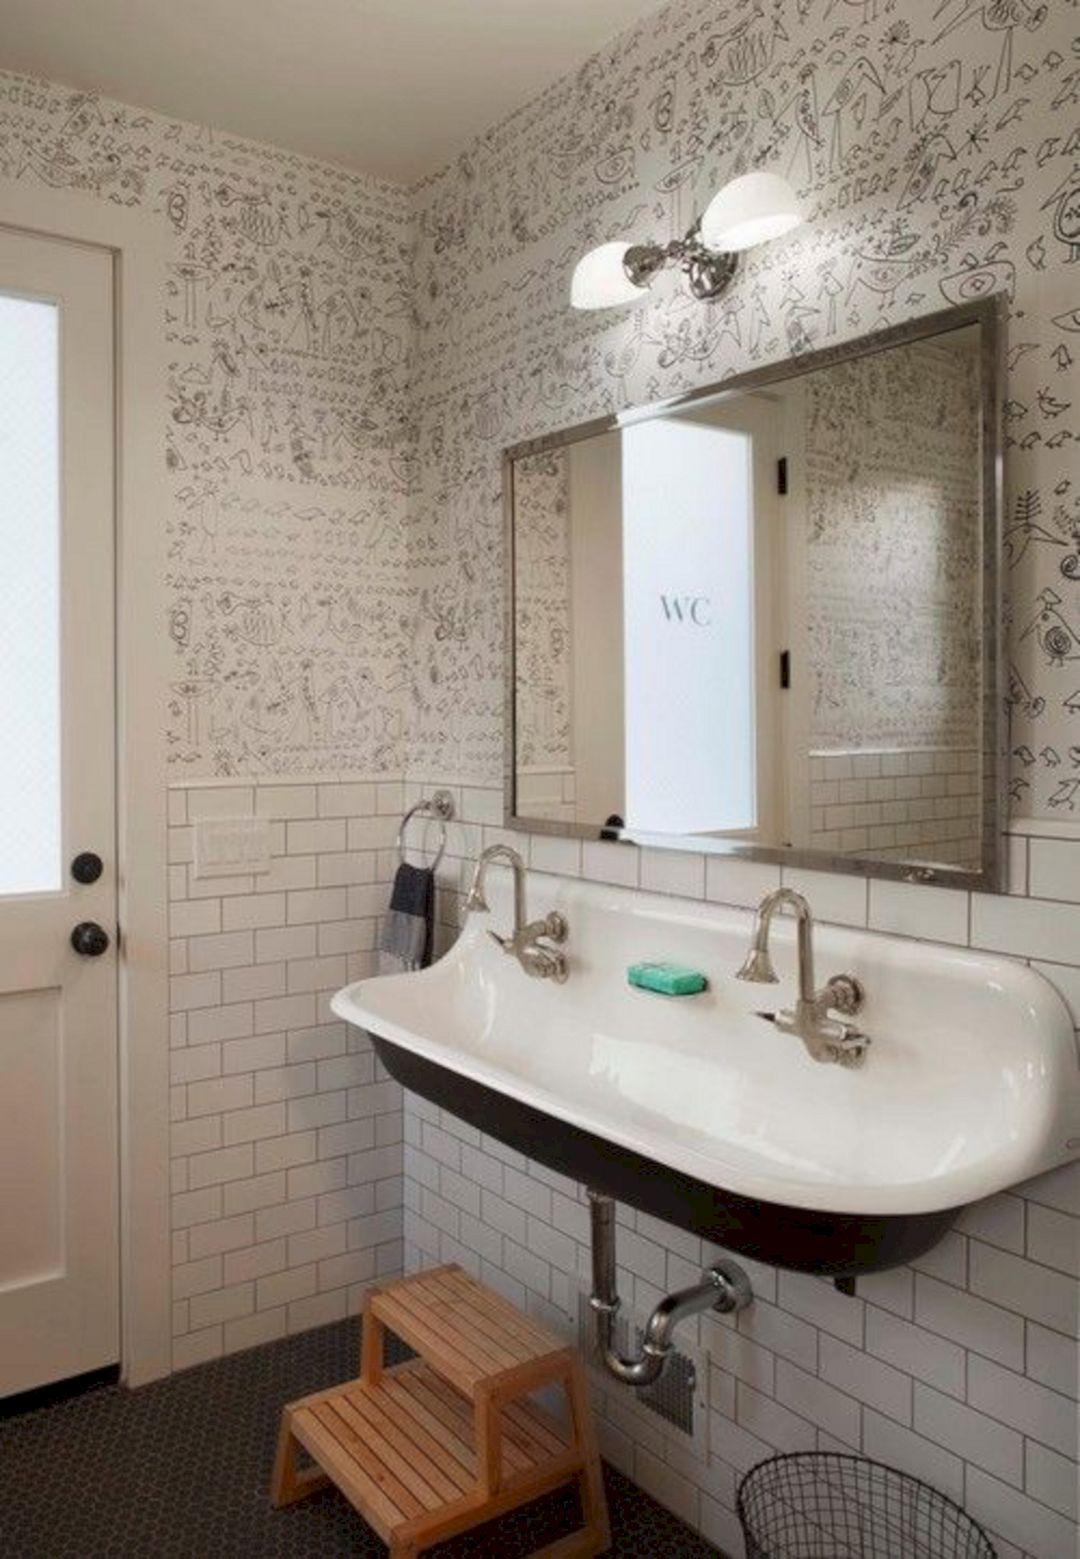 20 Most Beautiful Bathroom Lighting For Cozy Bathroom Inspiration Freshouz Com Bathroom Farmhouse Style Modern Farmhouse Bathroom Farmhouse Bathroom Decor [ 1559 x 1080 Pixel ]